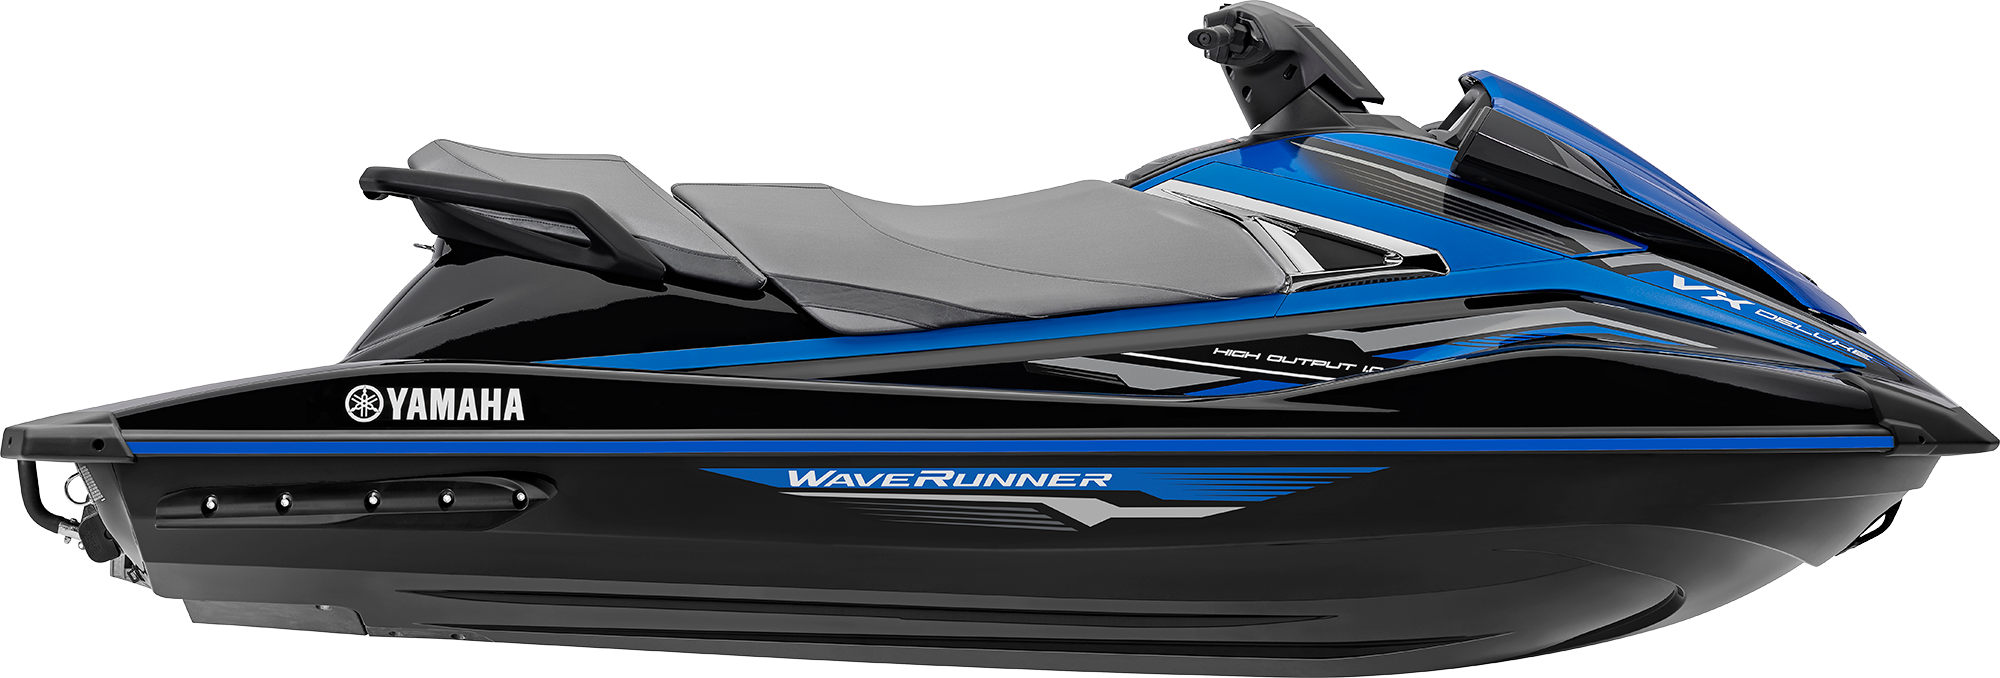 Yamaha VX Deluxe - 2018-VX-Deluxe-Black_1_l